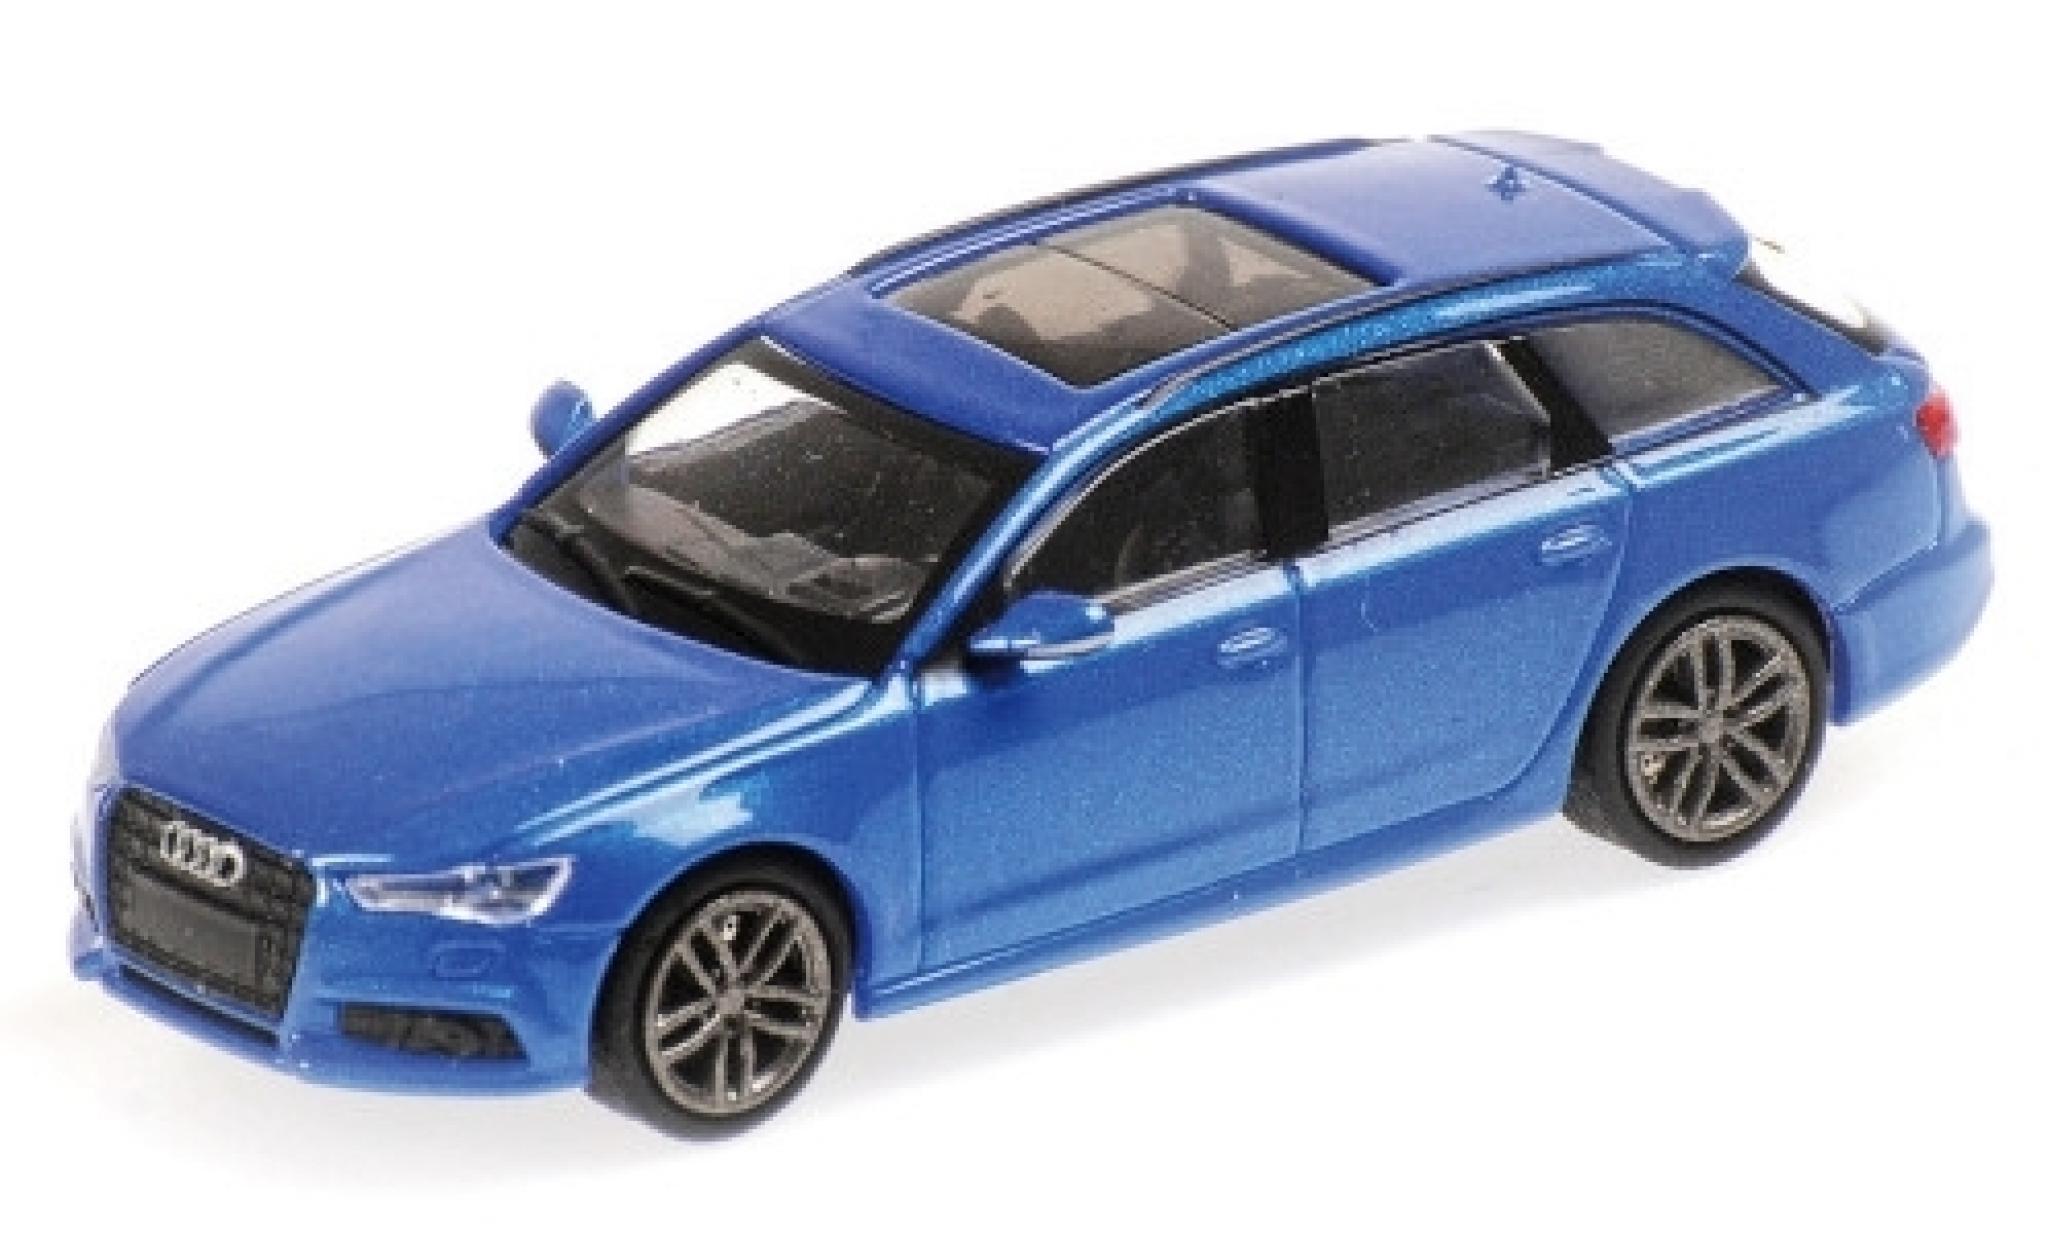 Audi A6 1/87 Minichamps Avant metallise bleue 2018